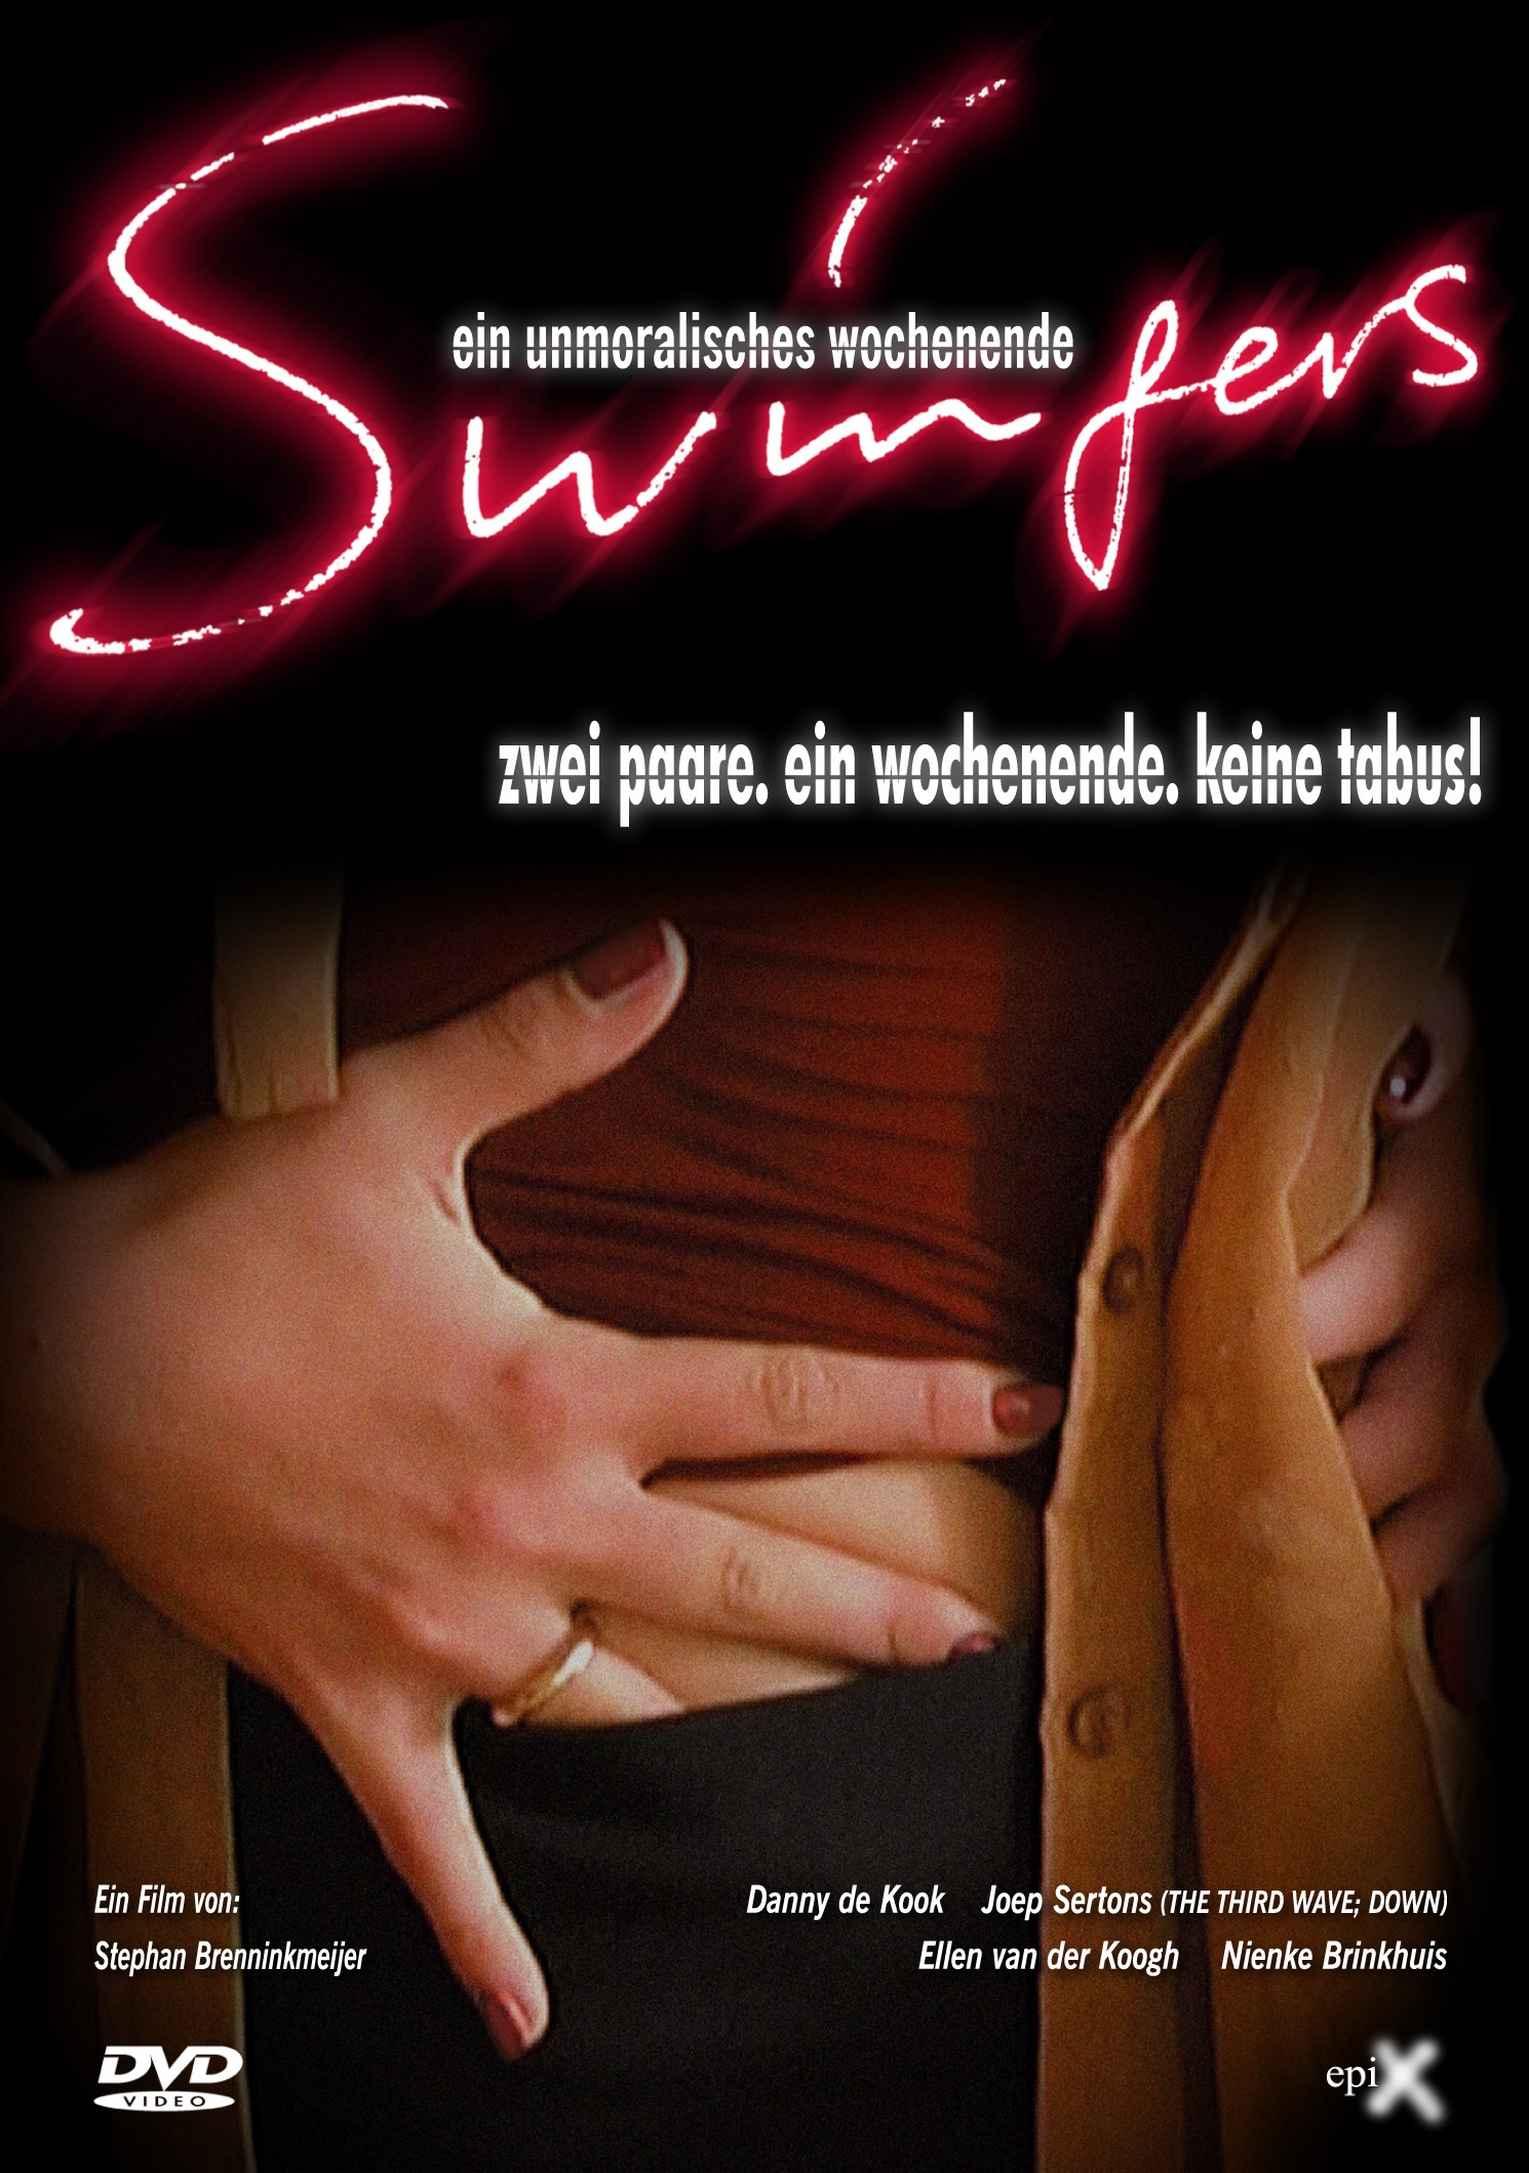 SWINGERS Coverfront